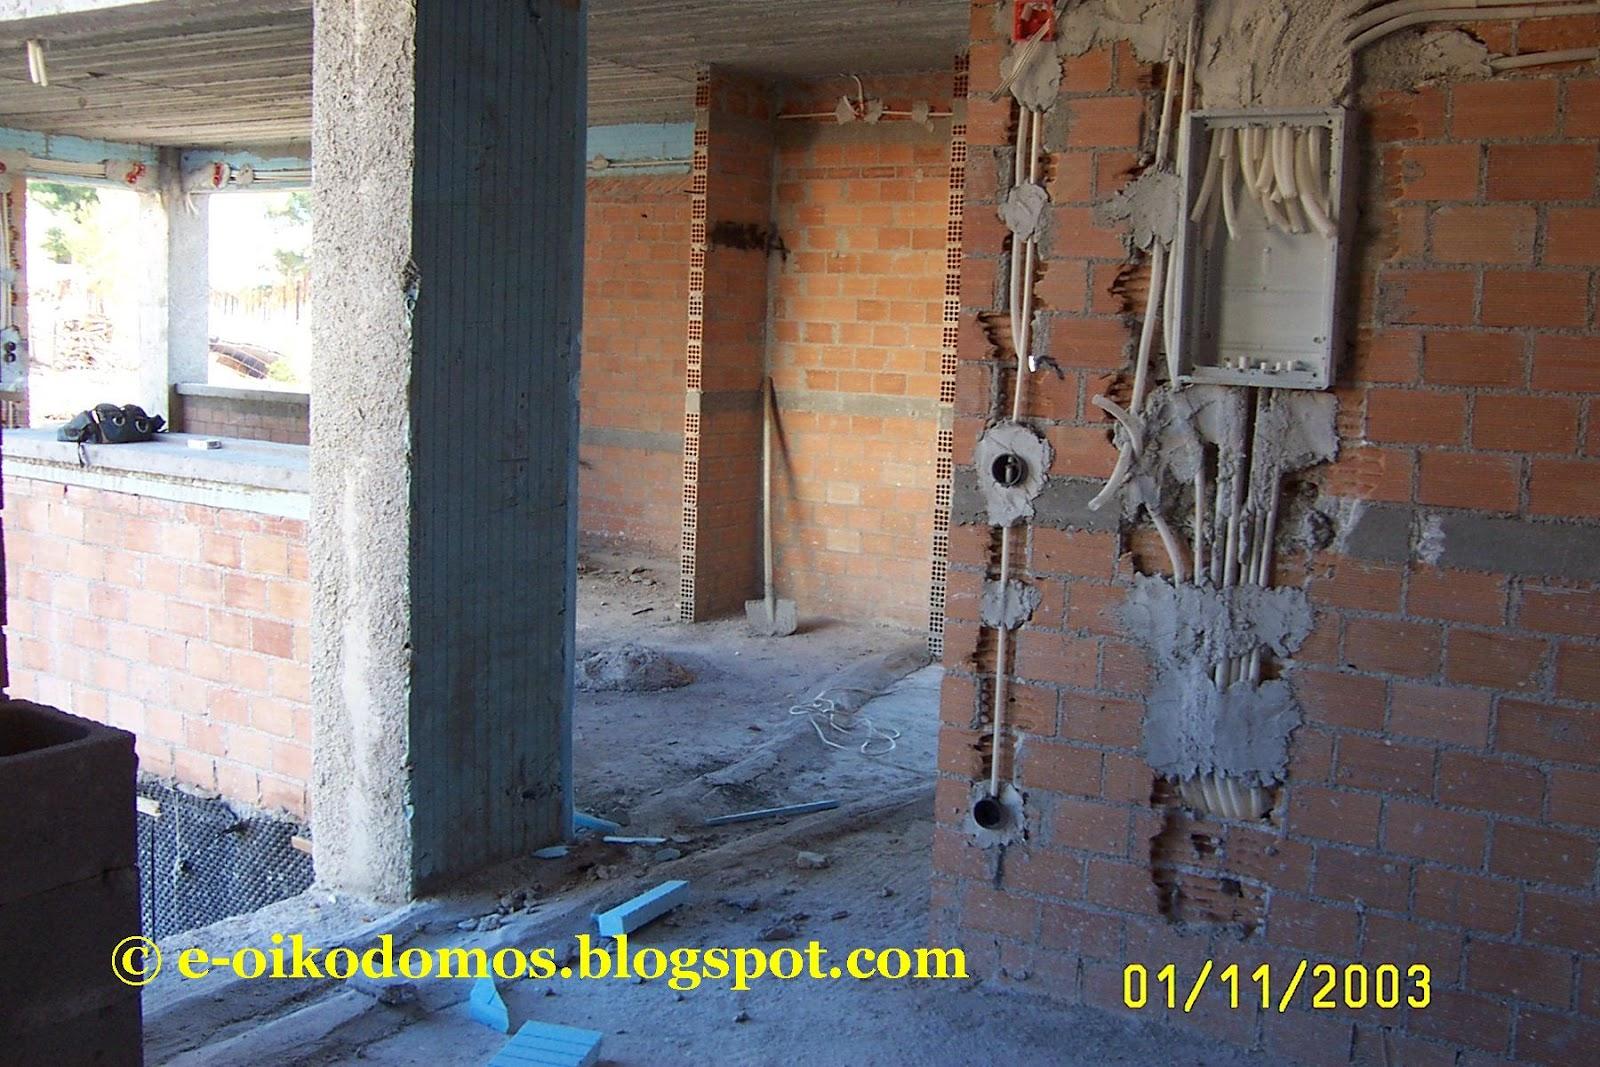 http://2.bp.blogspot.com/-Go8p3aJ7qIE/T7CGF6ZigFI/AAAAAAAAFTE/9eaEiQoVBlA/s1600/photo+059.jpg